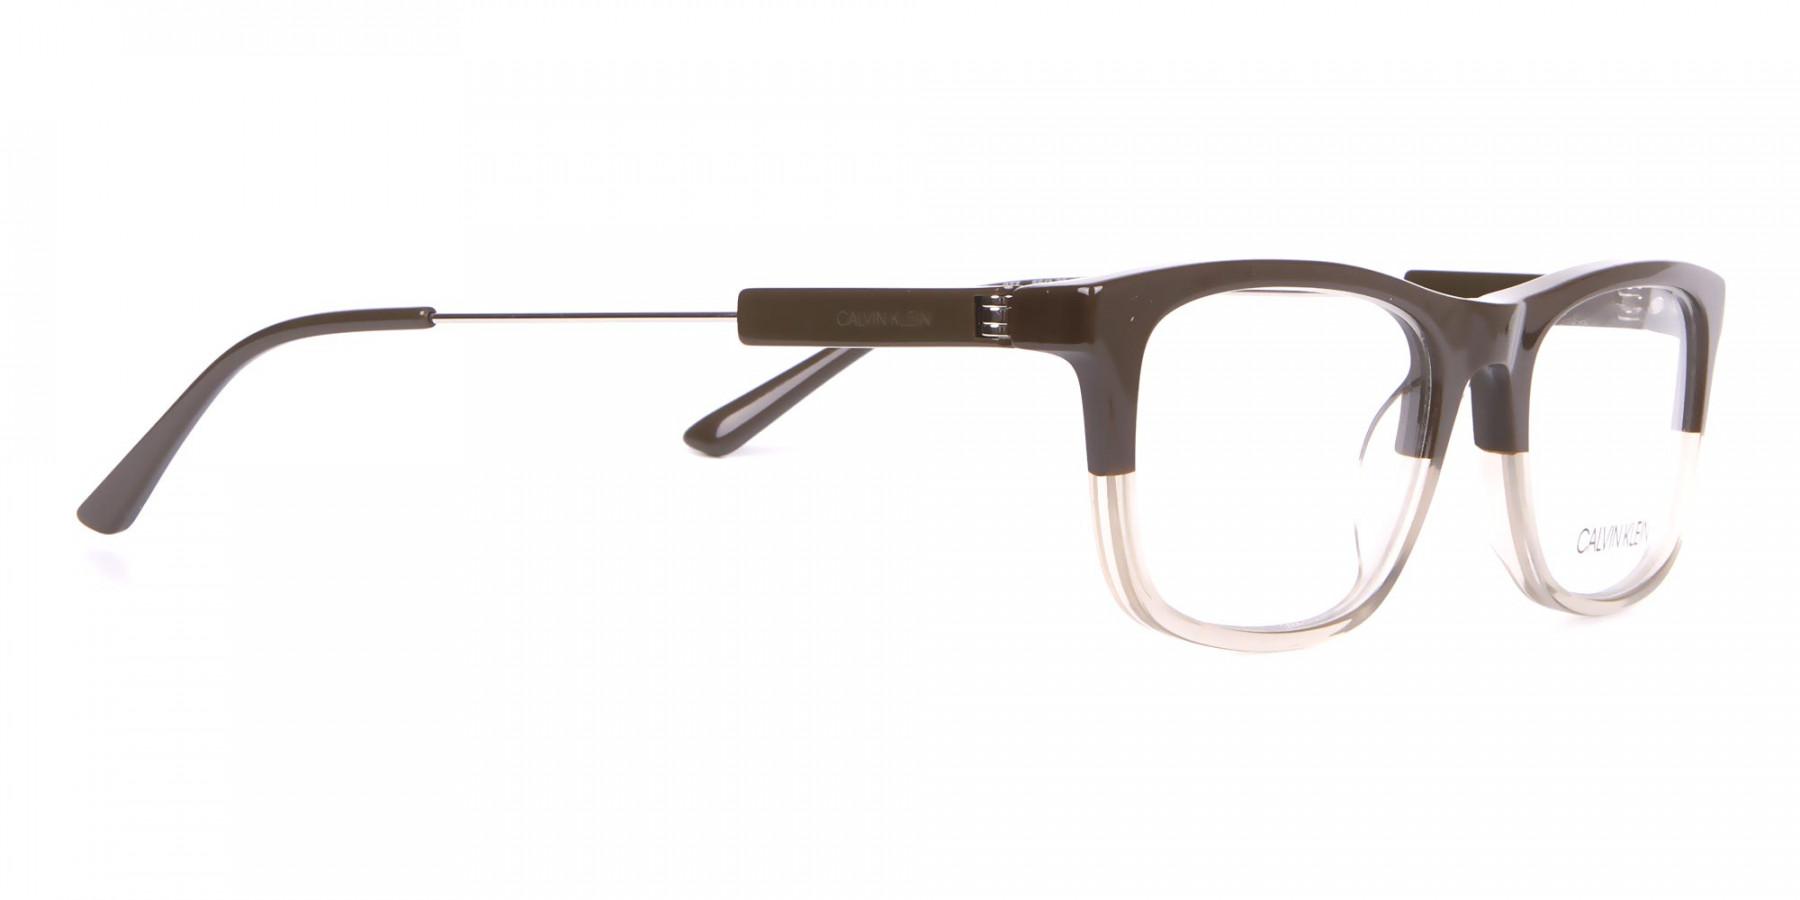 Calvin Klein CK19707 Two-Tone Rectangular Glasses In Brown-1